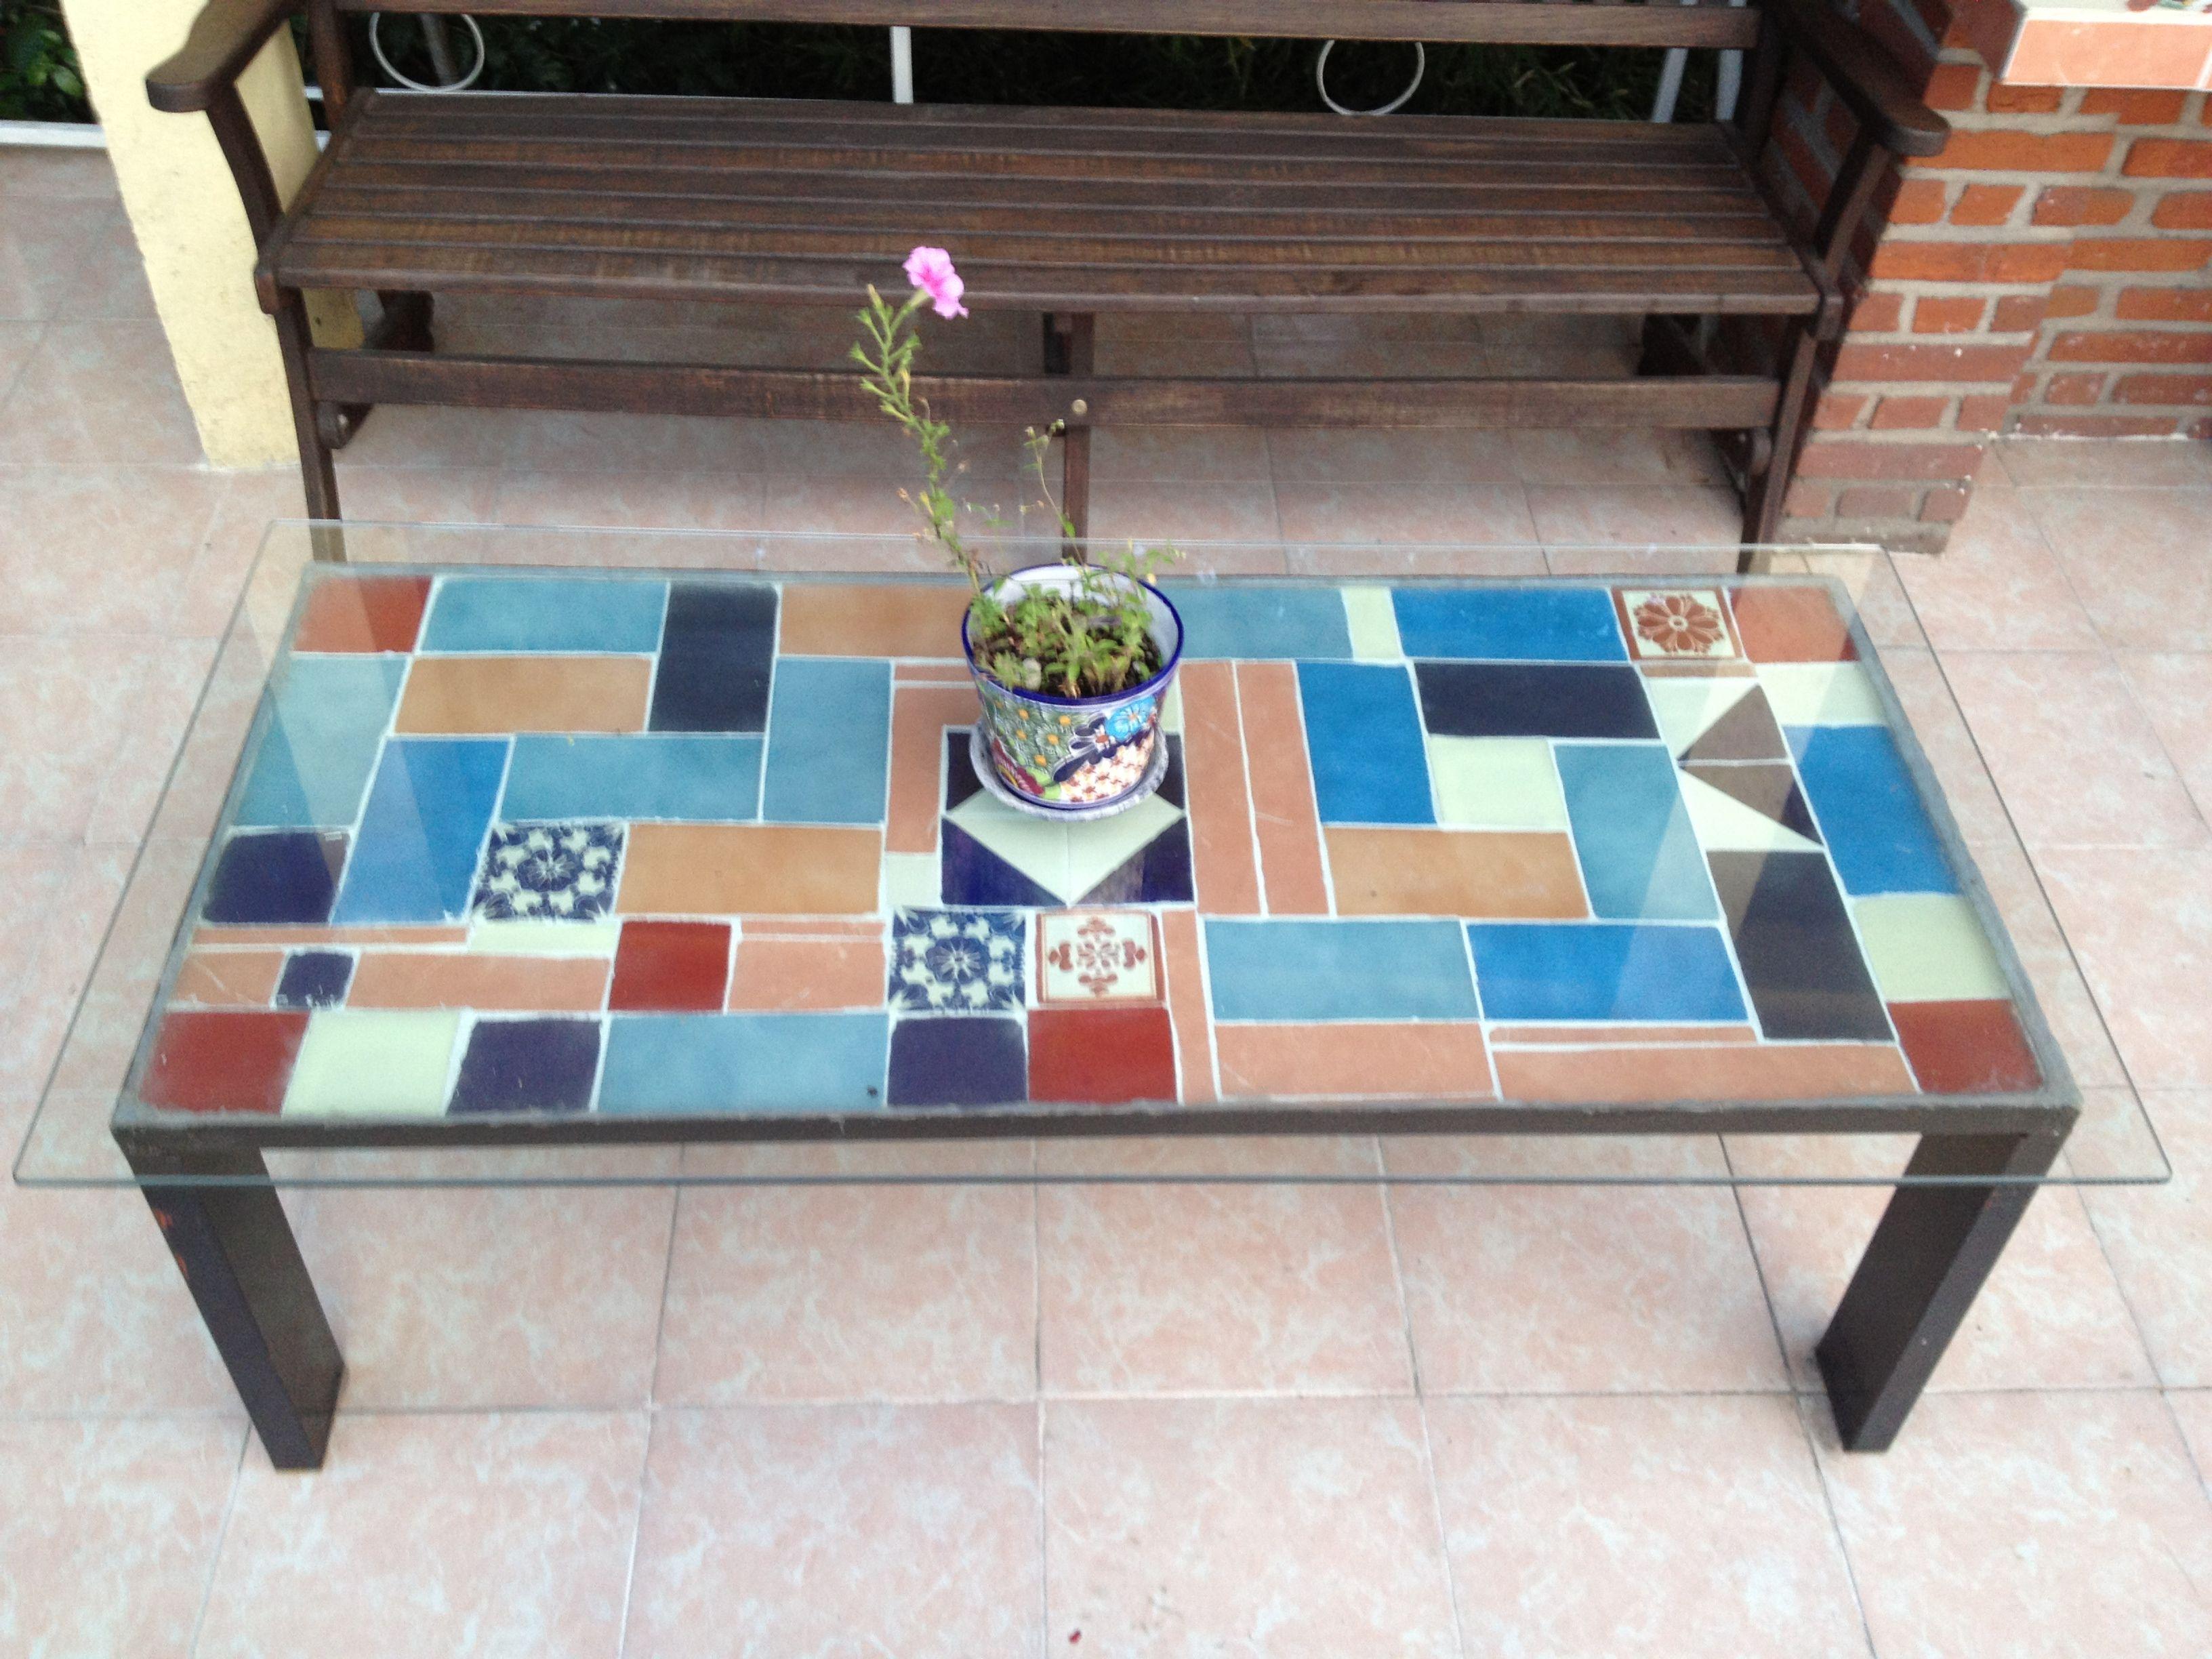 Mesa hecha con retazos de mosaicos.